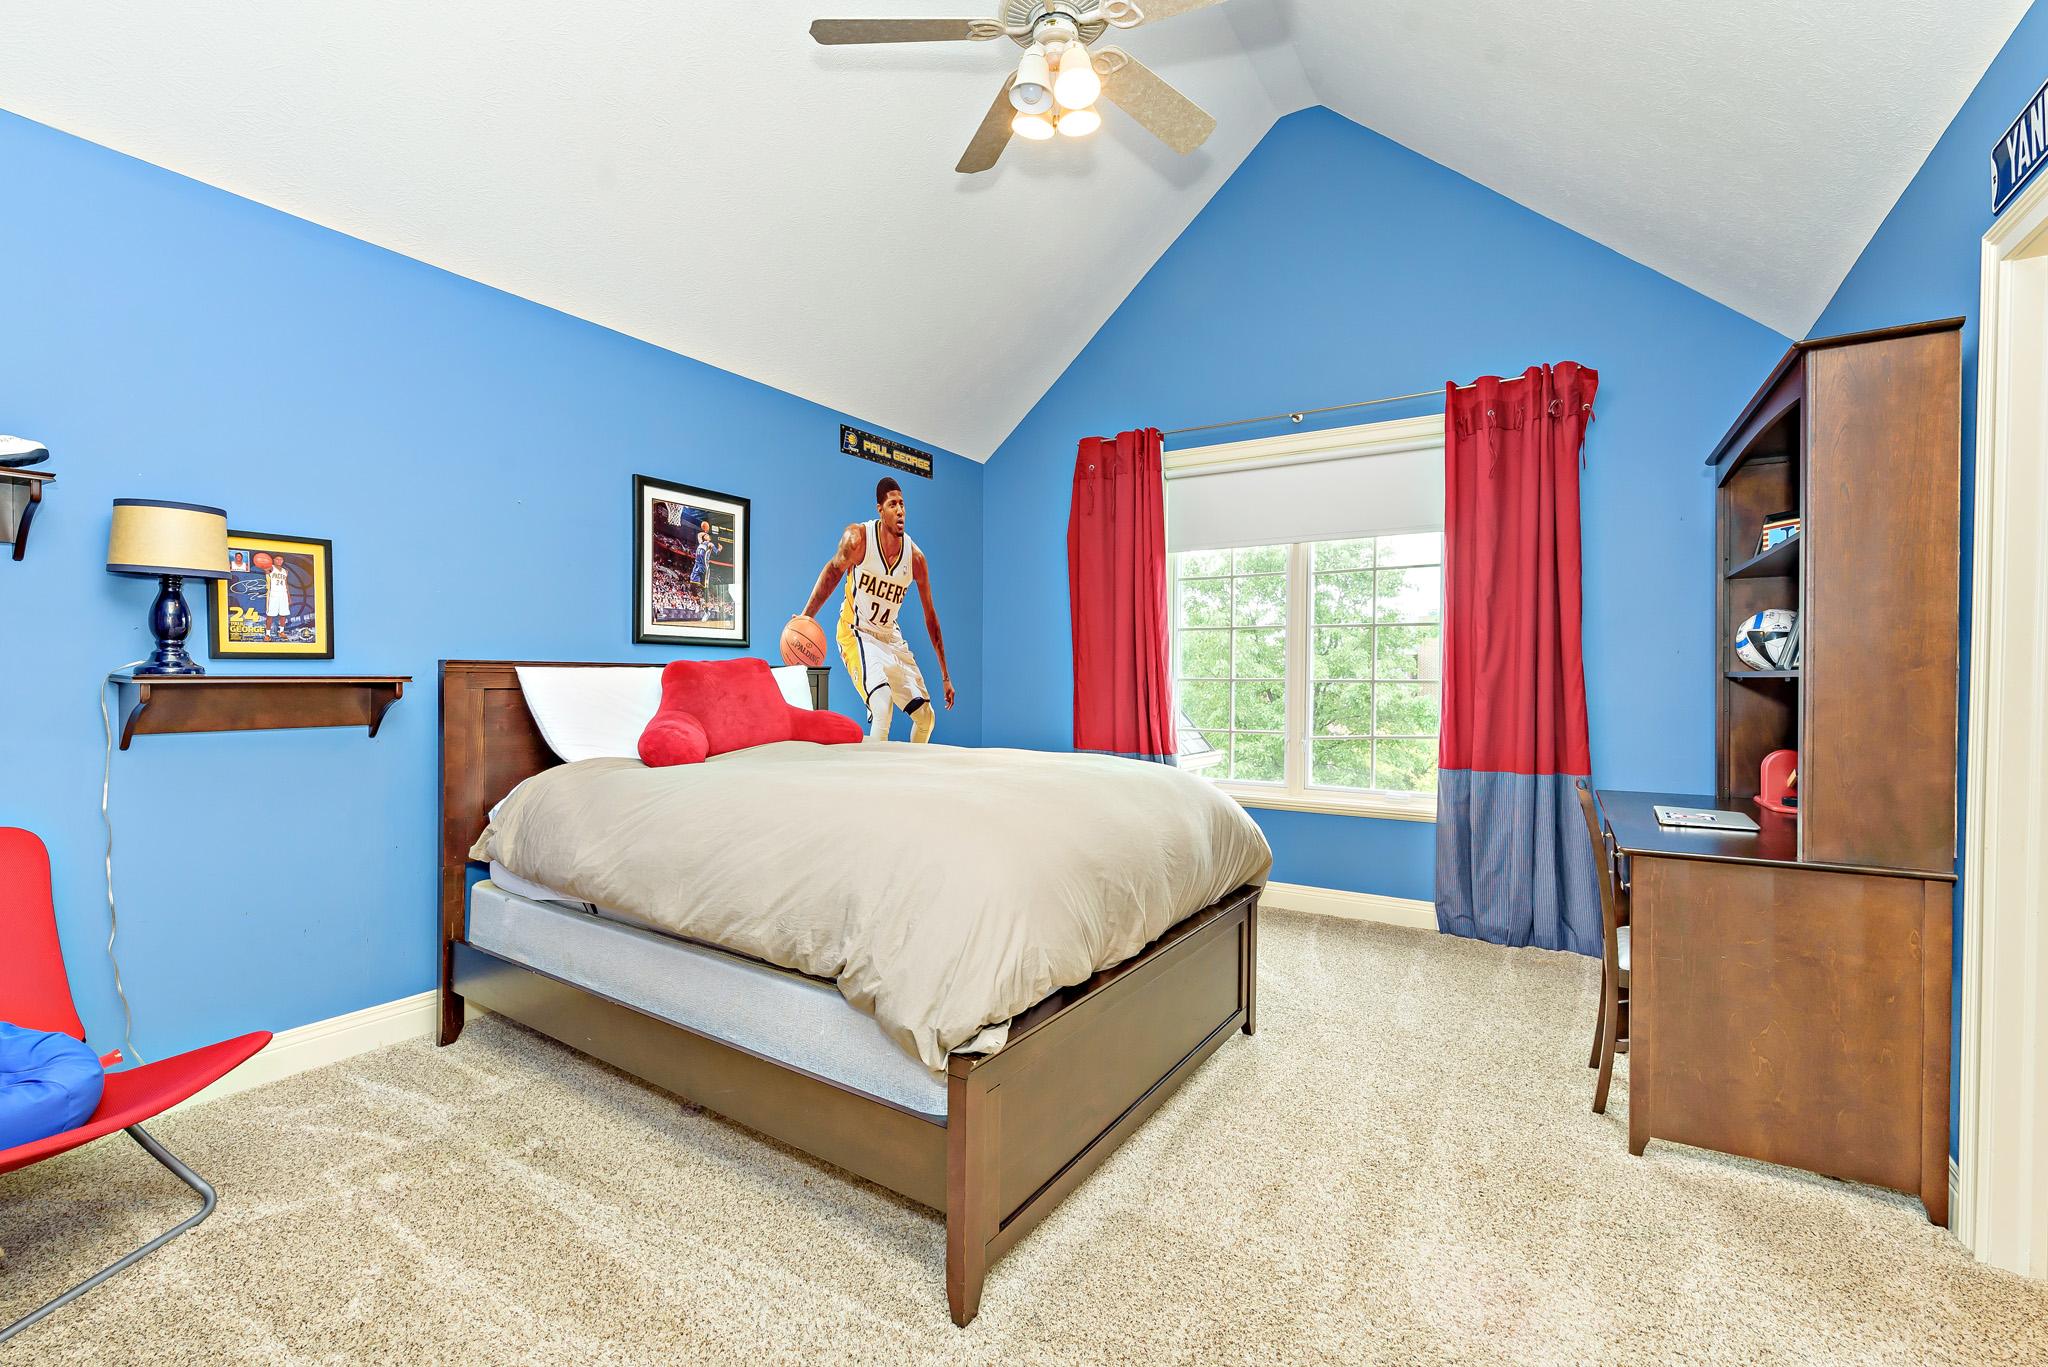 33_Bedroom 4.jpg